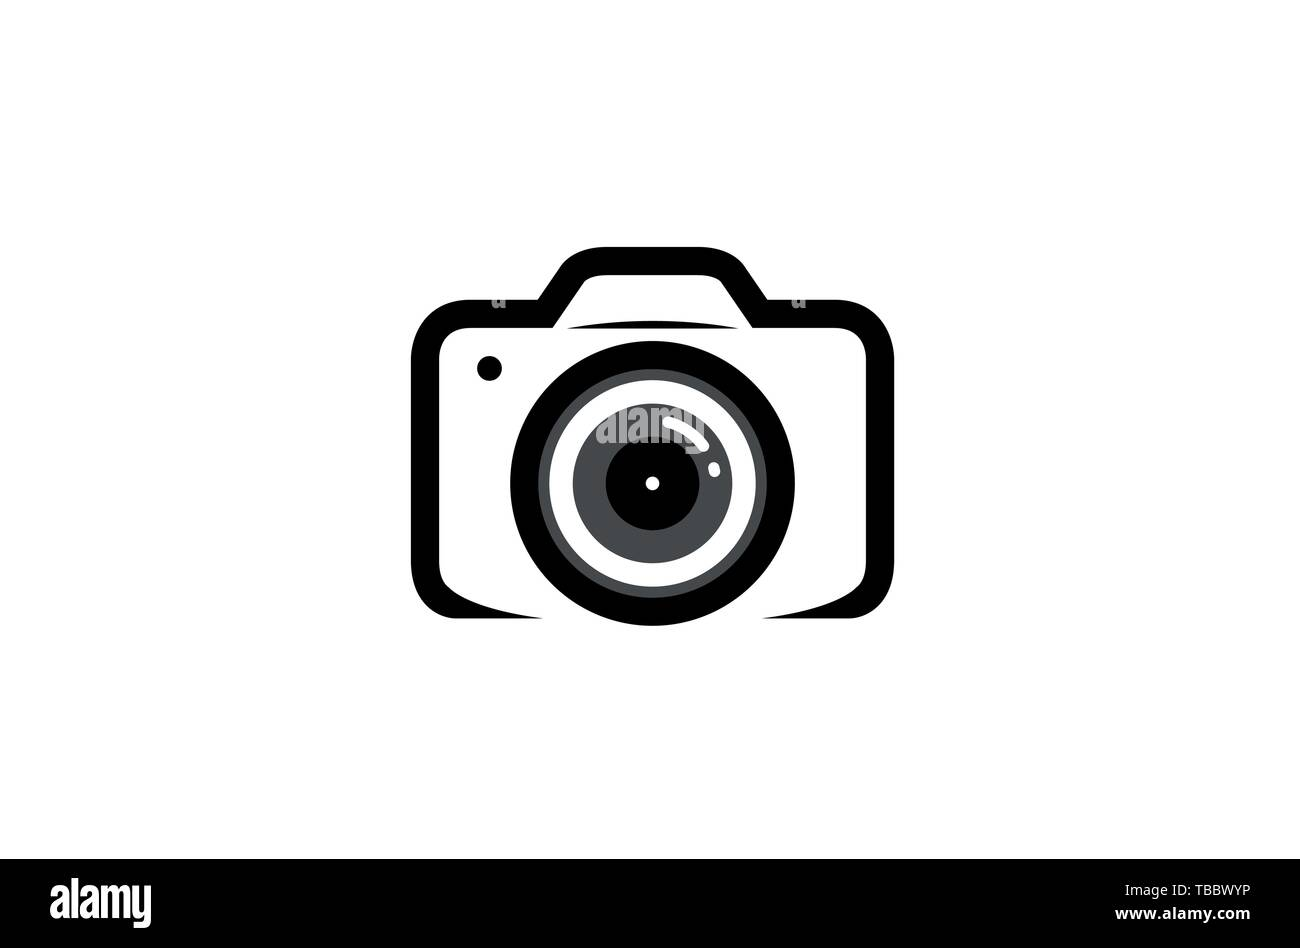 Creative Black Camera Logo Design Symbol Vector Illustration Stock Vector Image Art Alamy